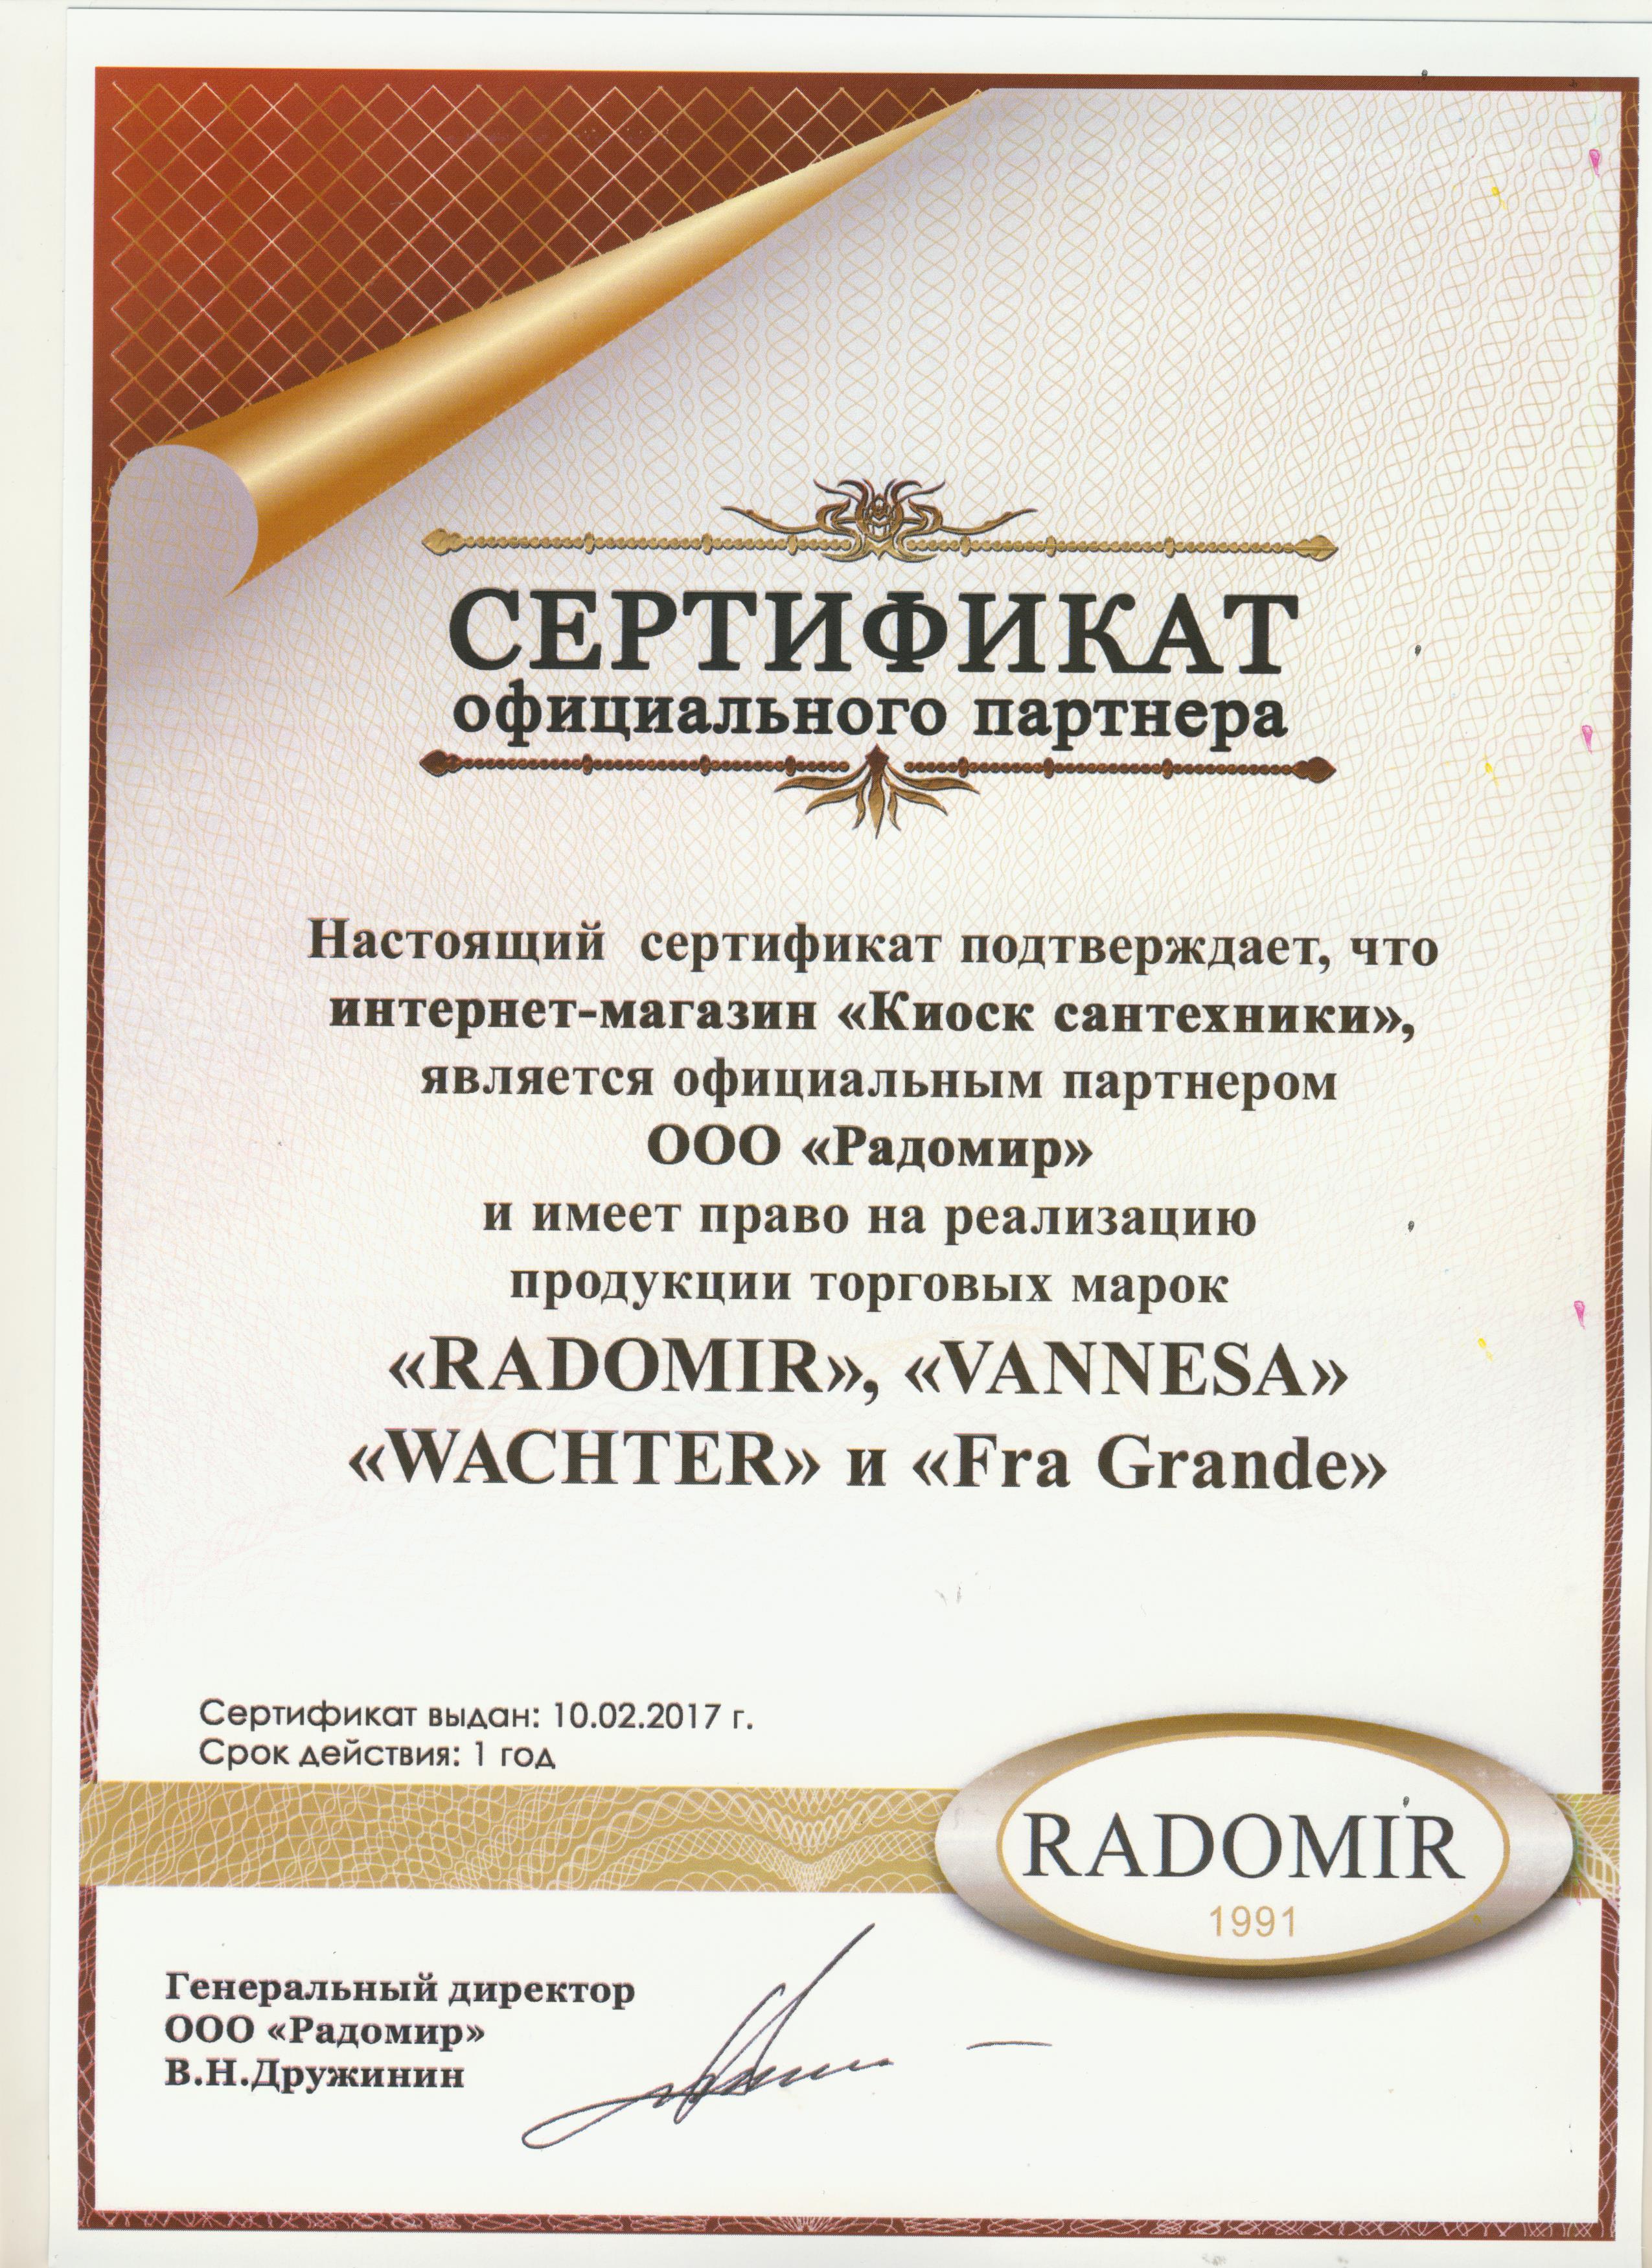 Фото 9973: Гидромассажная ванна Радомир (Radomir) ЛАГУНА CHROME серия Сomfort